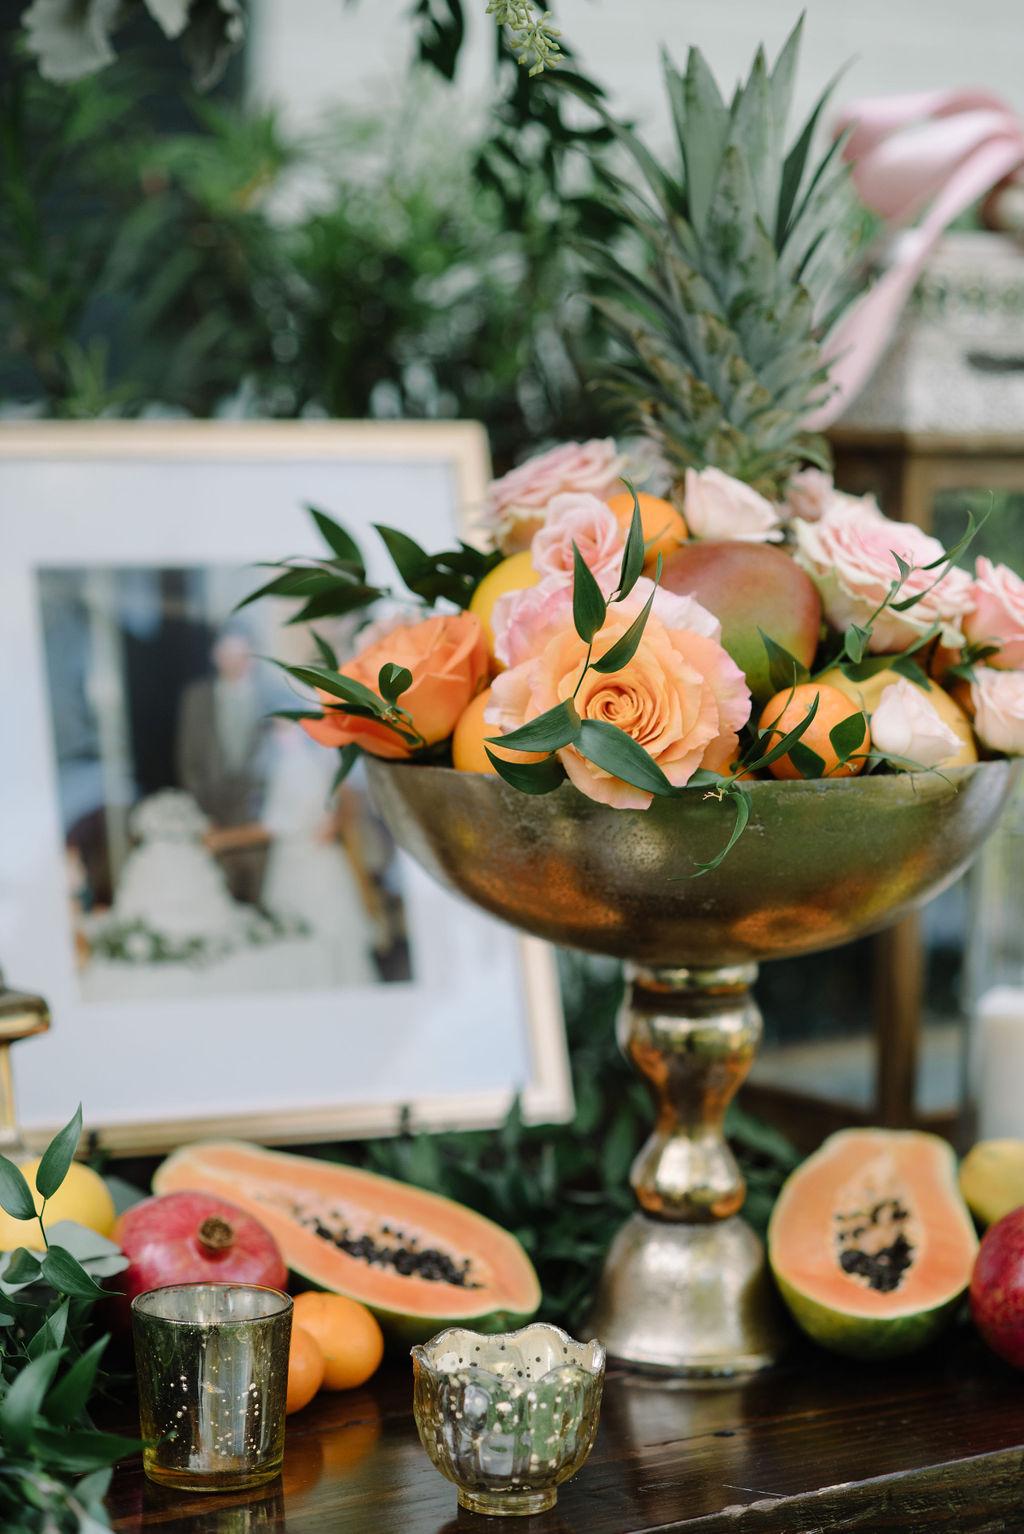 Romantic Whimsical Wedding Reception Decor, Gold Bowl with Fruit and Orange, Blush Pink Roses | St. Petersburg Wedding Rentals Gabro Event Services | Tampa Bay Wedding Florist Bruce Wayne Florals